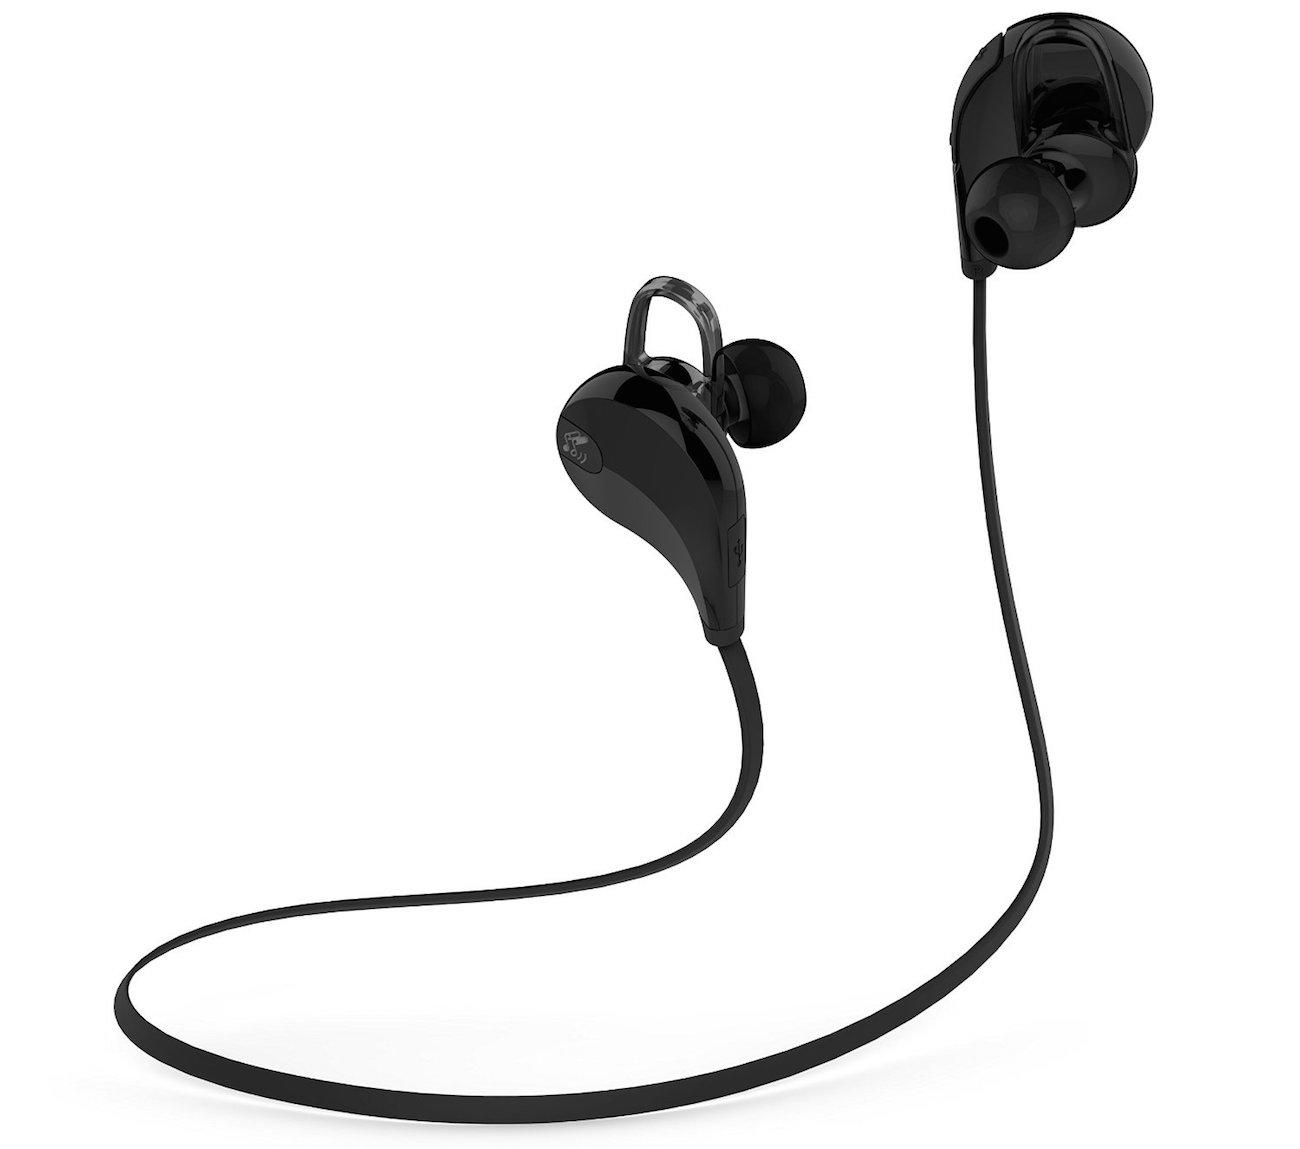 Lightweight small wireless earbuds - wireless earbuds qy8